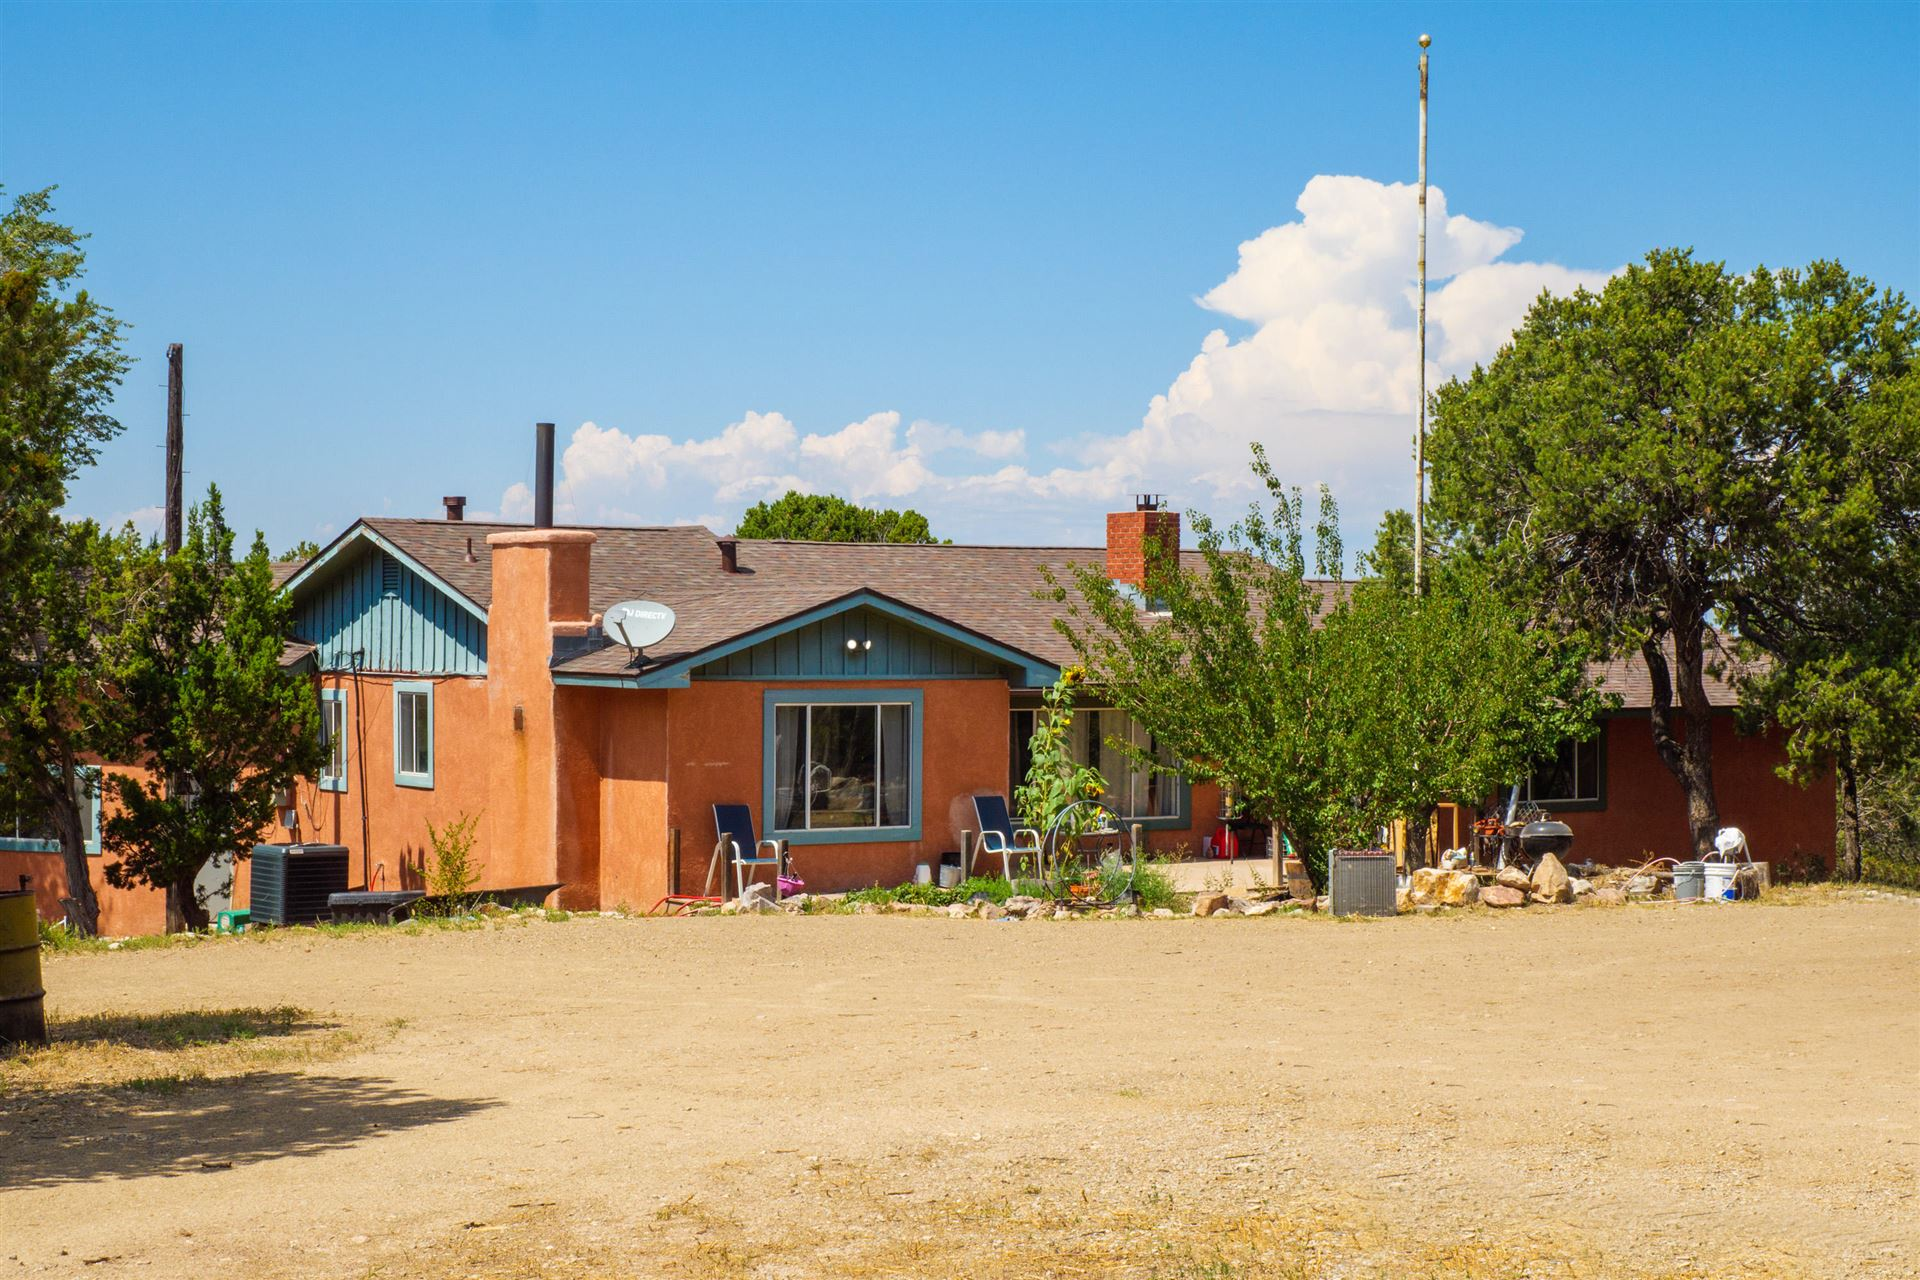 30 CANYON Road, Sandia Park, NM 87047 - #: 975980